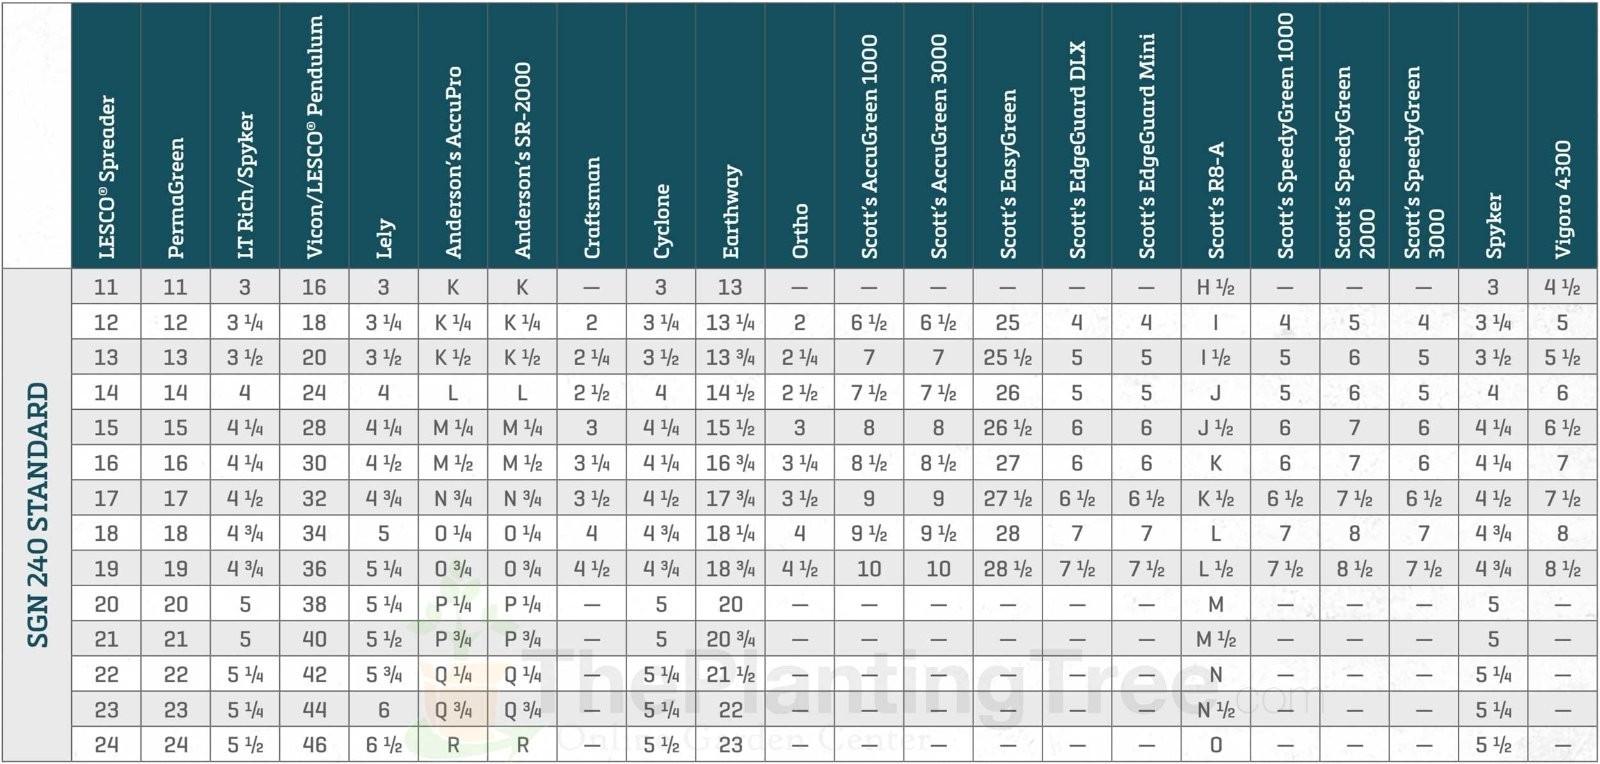 scotts edgeguard spreader settings chart